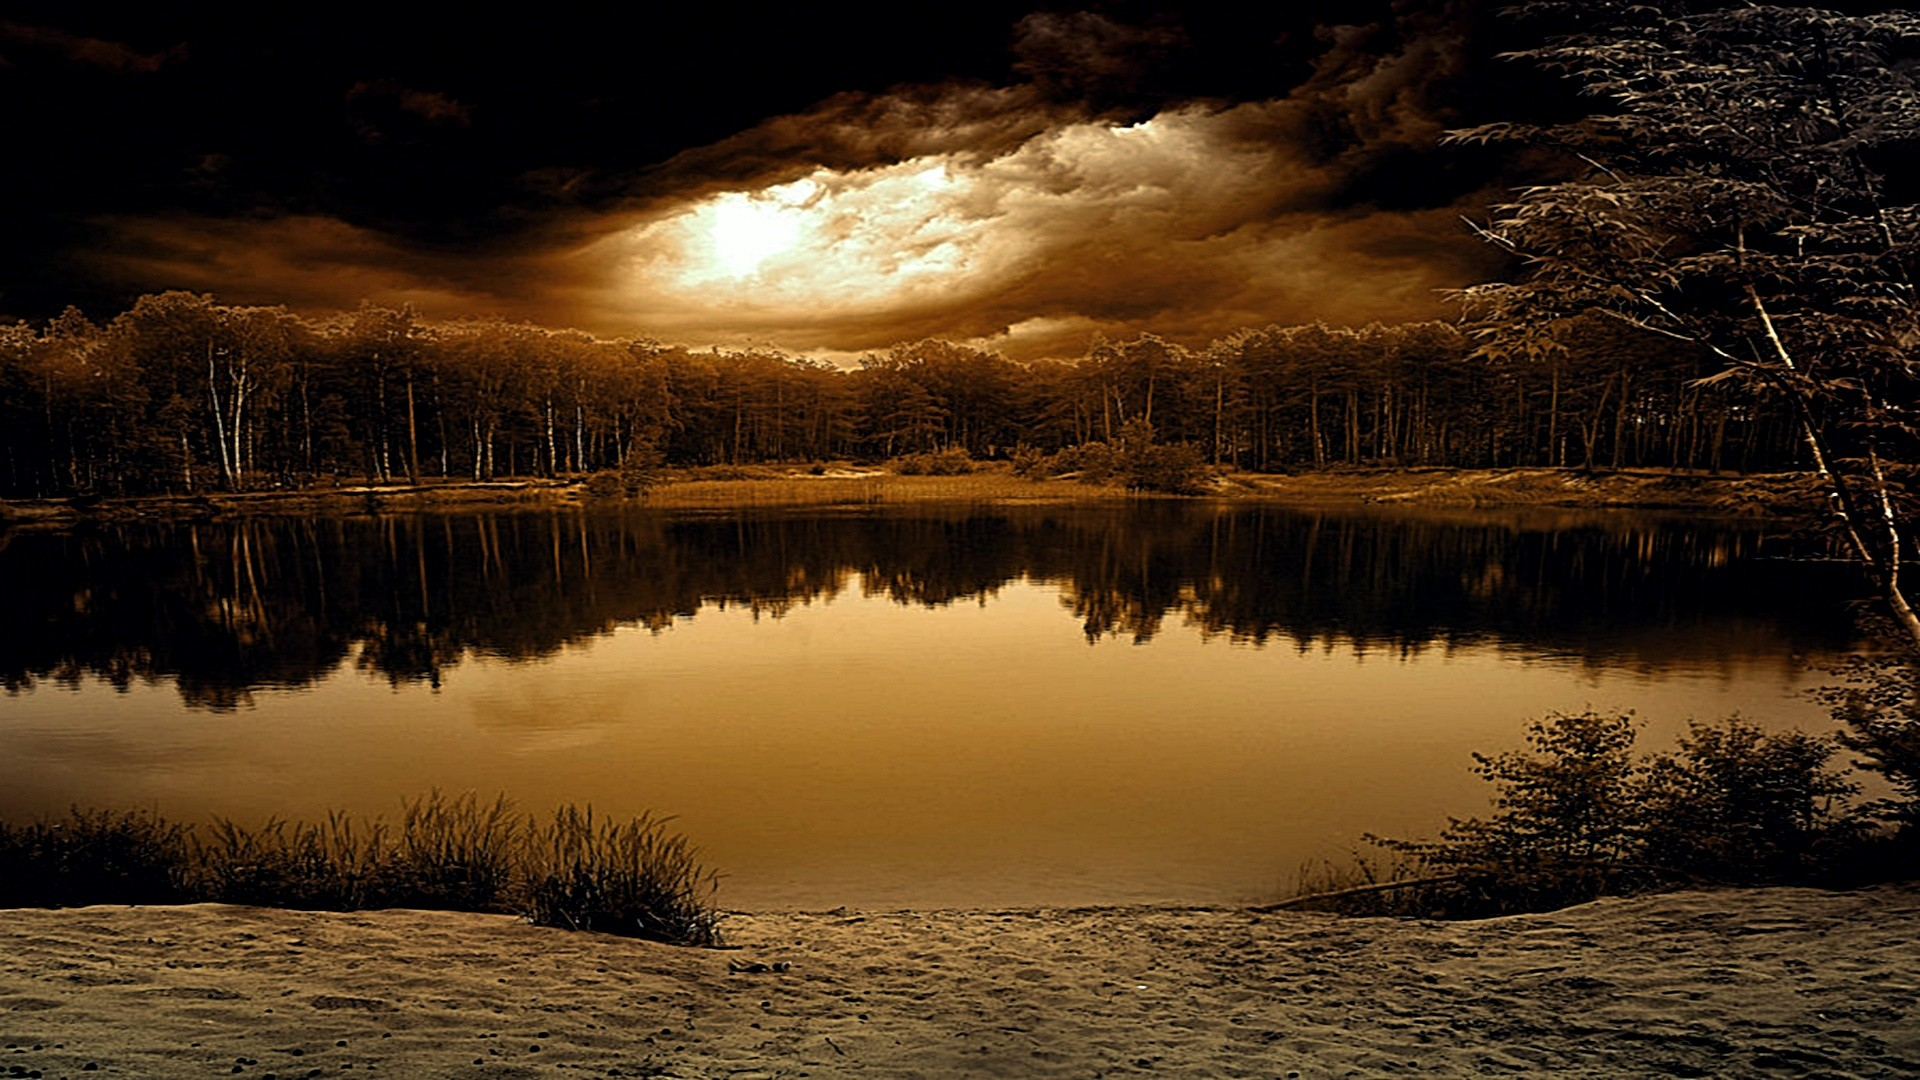 ... nature beautiful images desktop background hd nature wallpapers